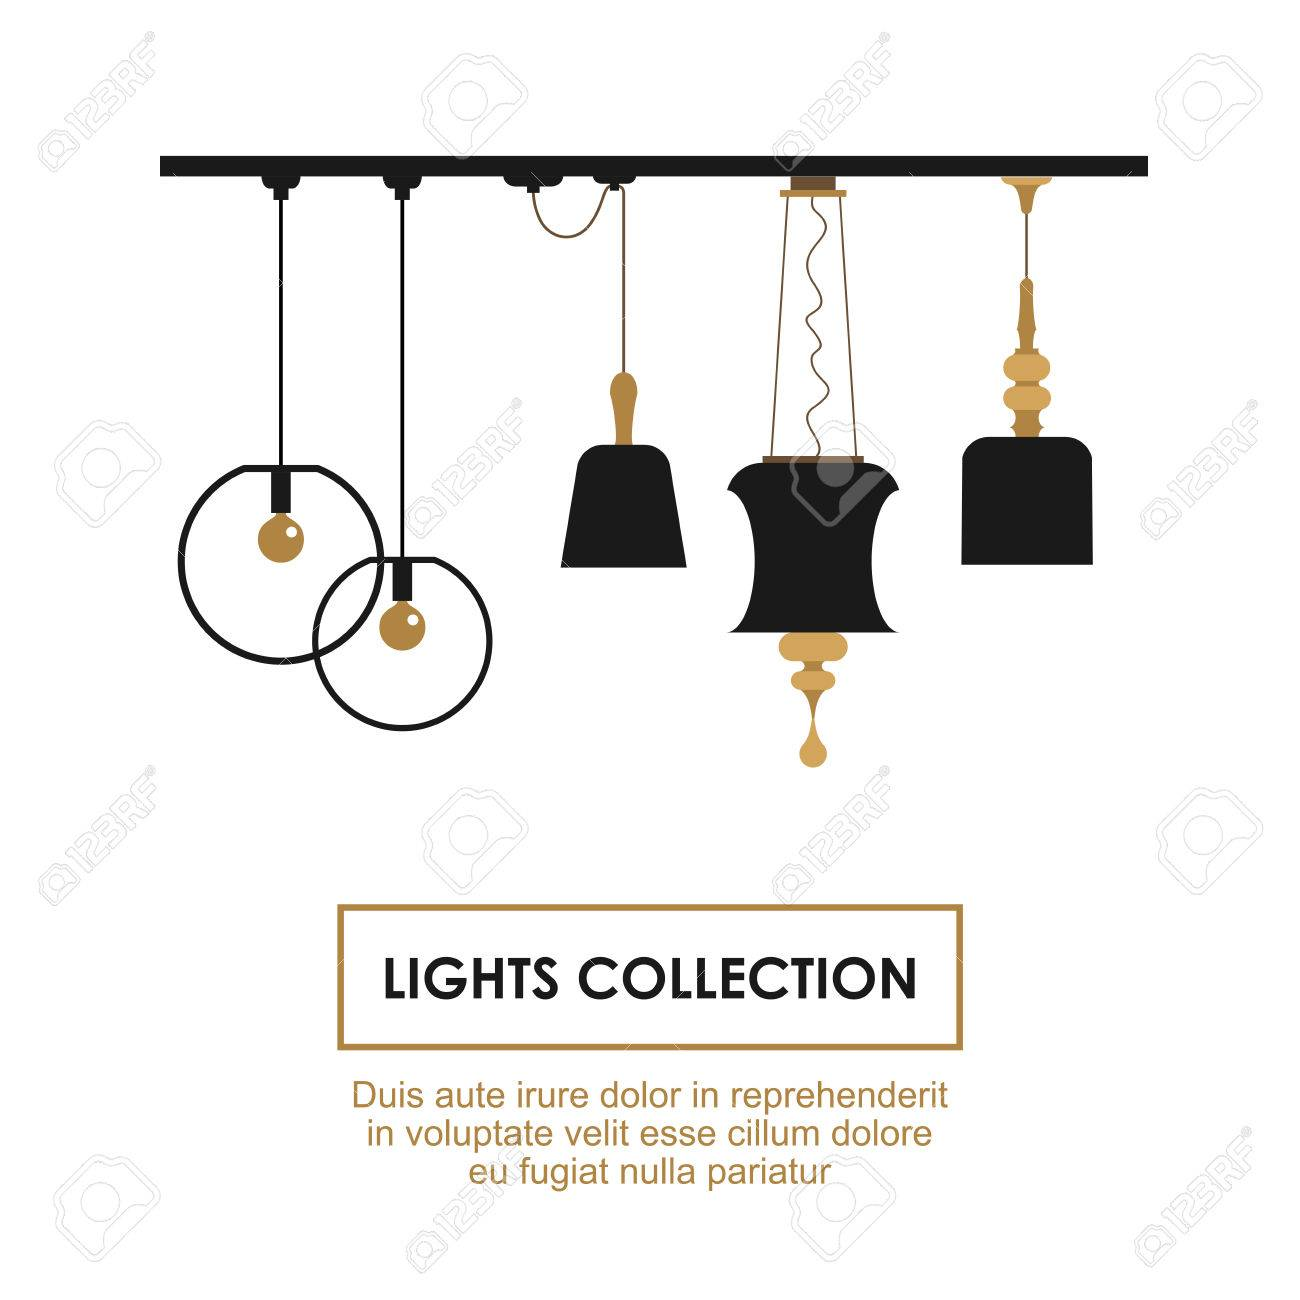 lights collection symbols set vector elements for interior design